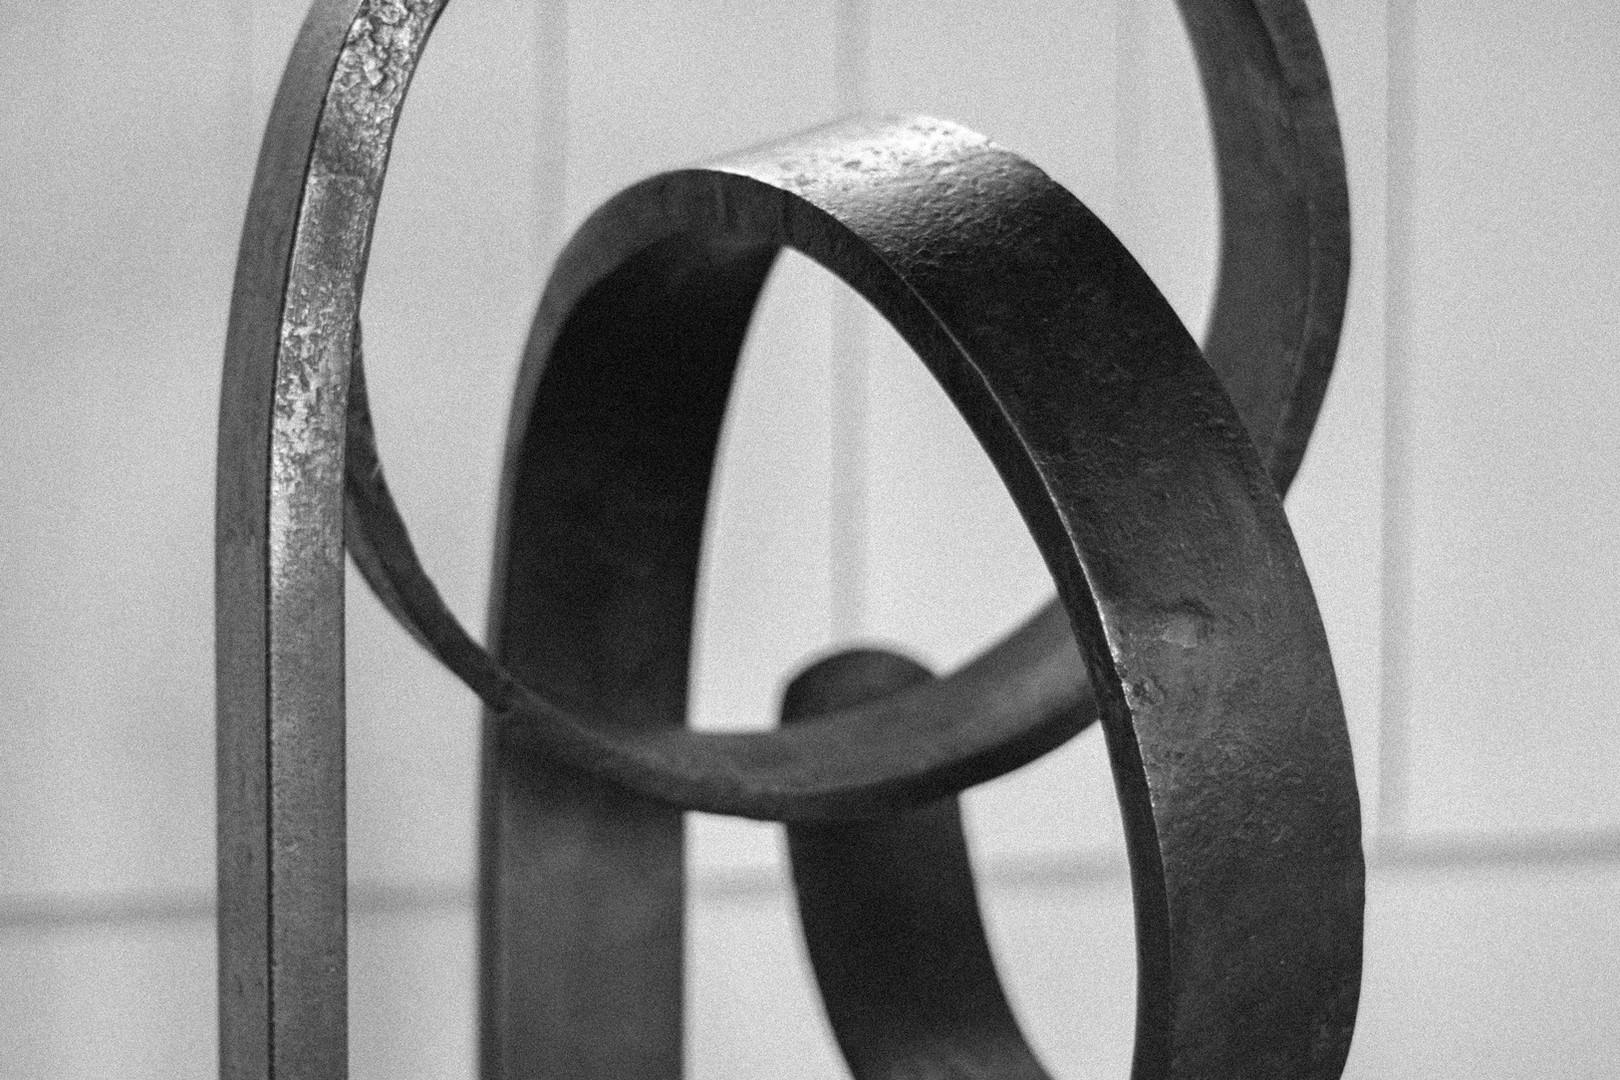 2020_Thomas_Gontar_Change_Sculpture_A04.